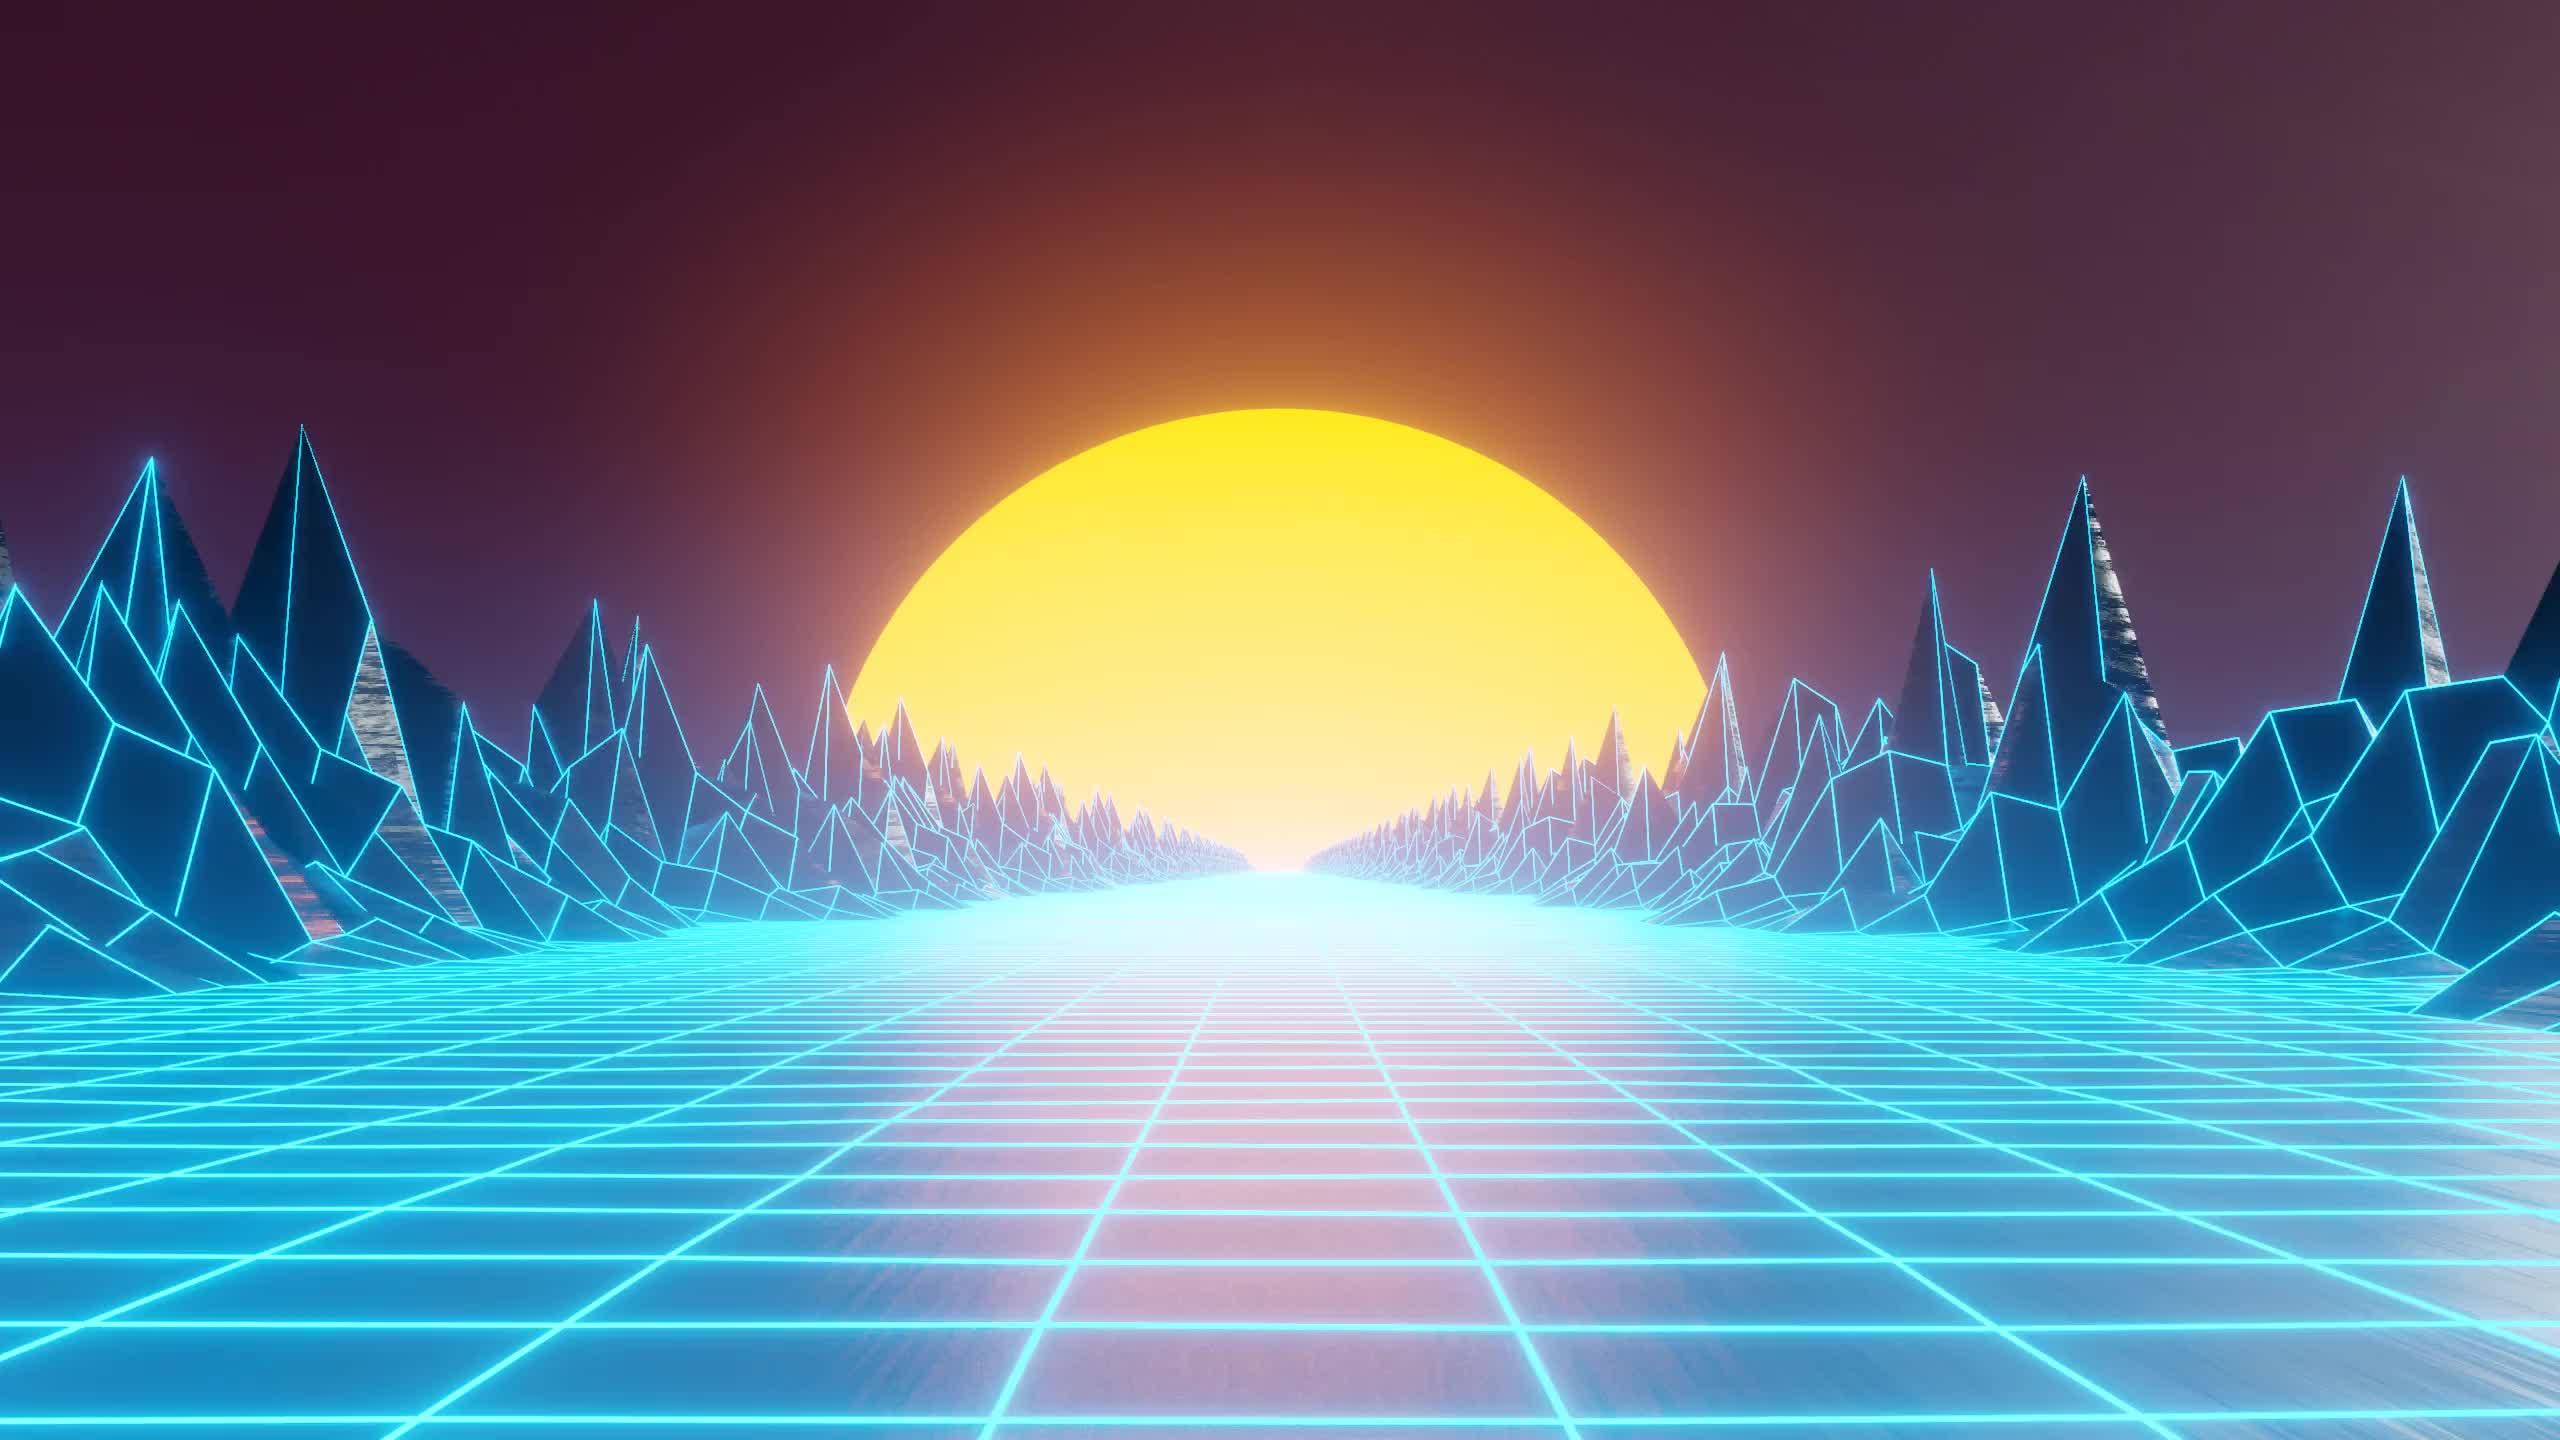 Outrun GIFs